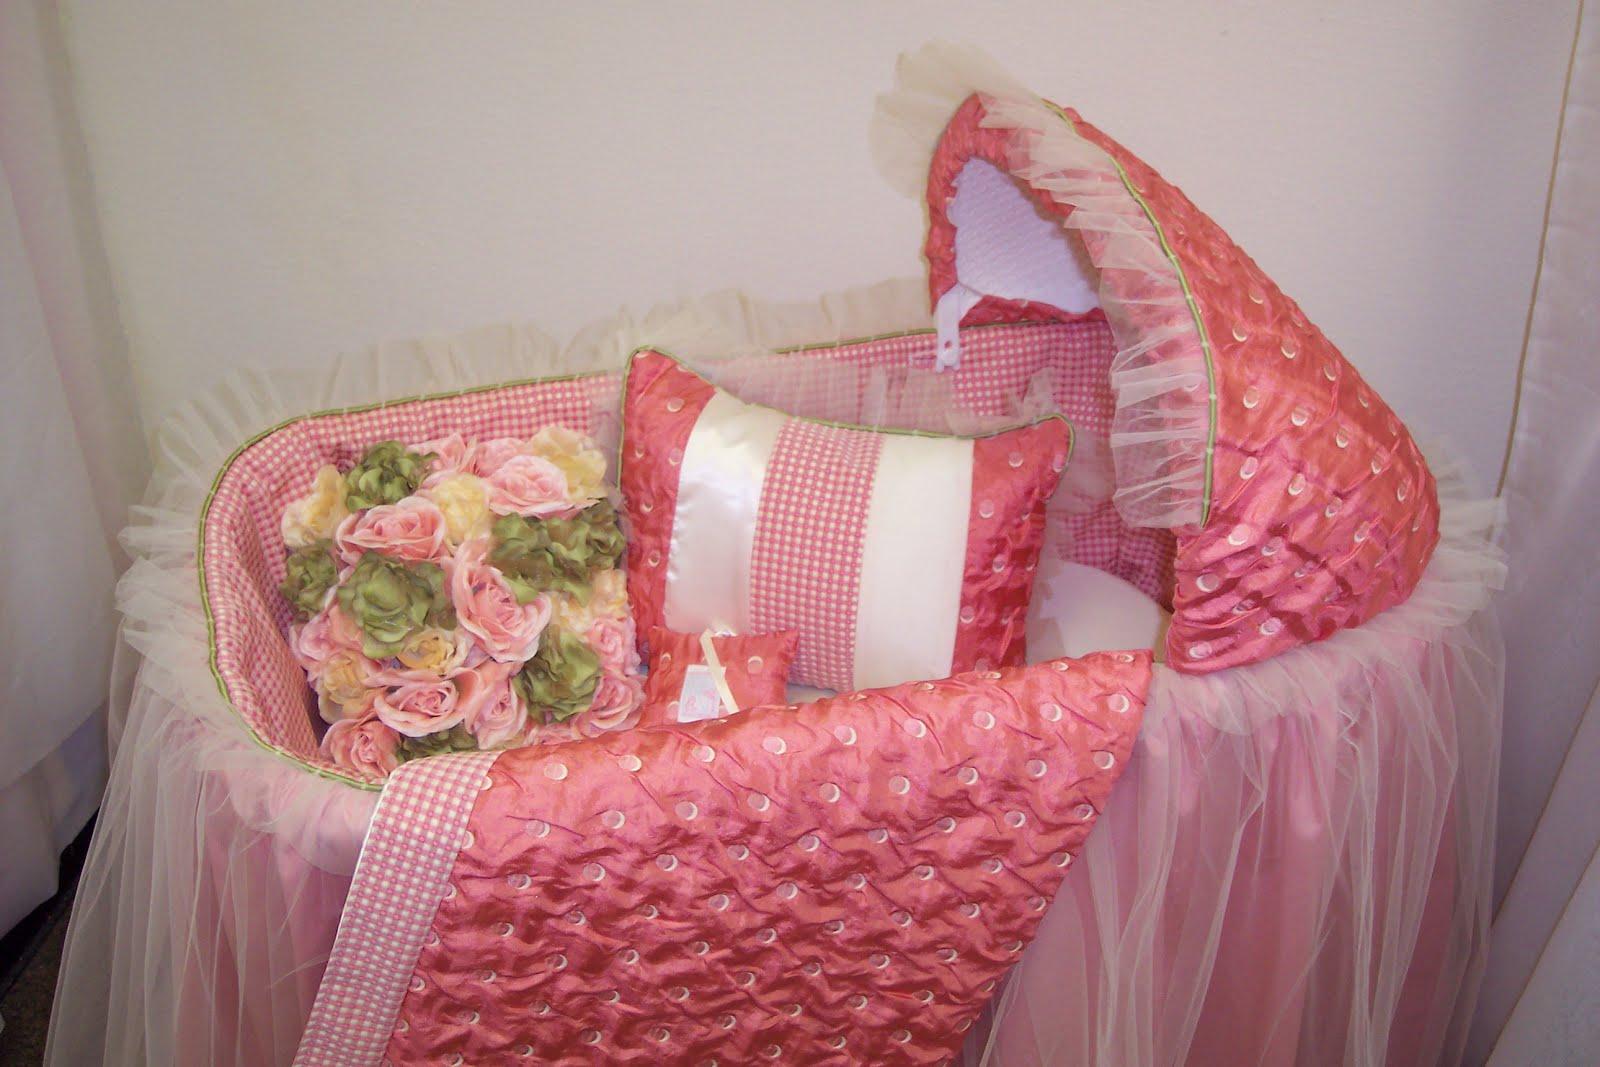 Designer Baby Bedding By Nava S Designs Bassinets All